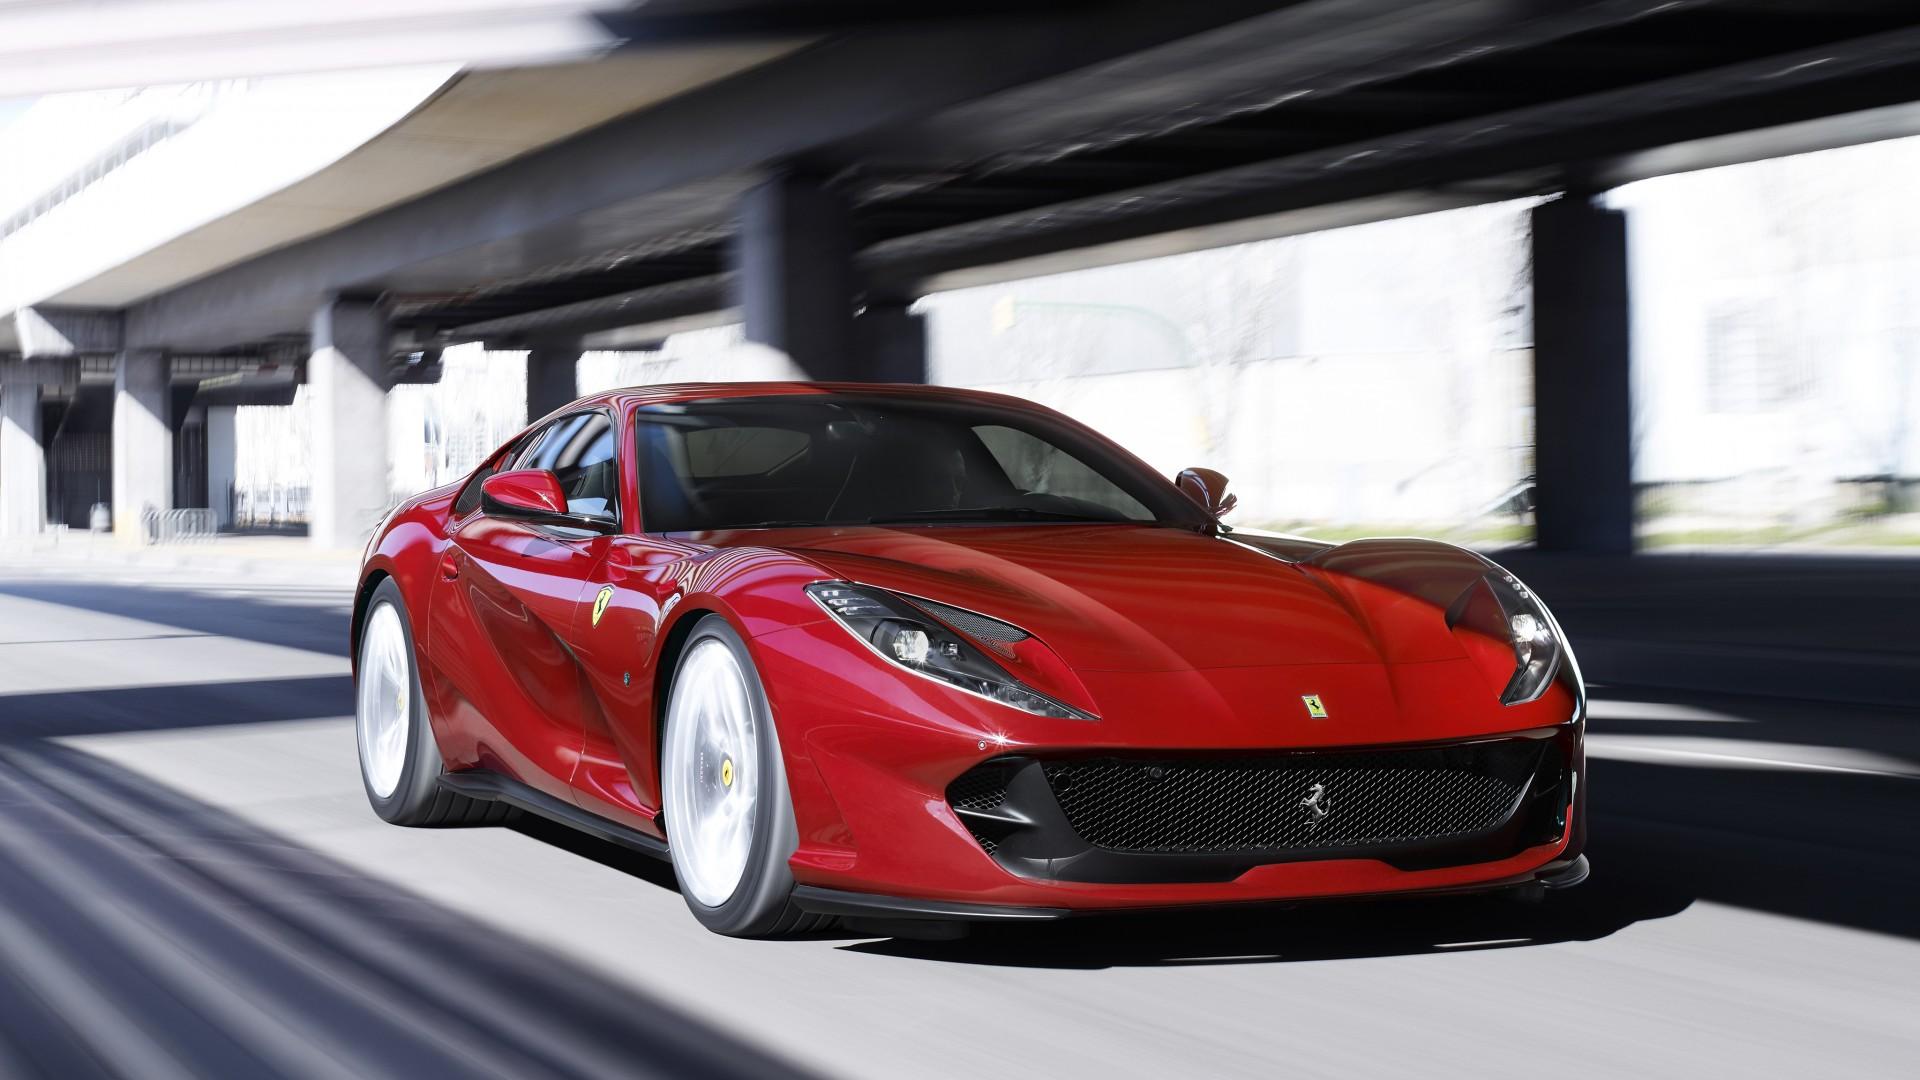 Super Fast Car Wallpaper Ferrari 812 Superfast 2018 4k 3 Wallpaper Hd Car